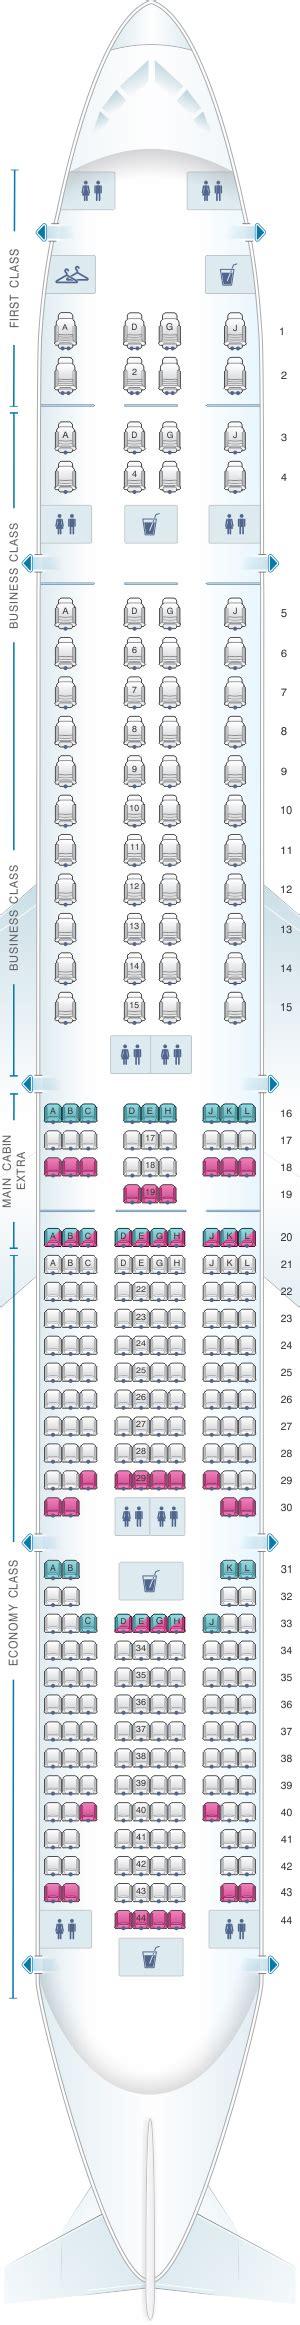 plan siege boeing 777 300er plan de cabine airlines boeing b777 300er